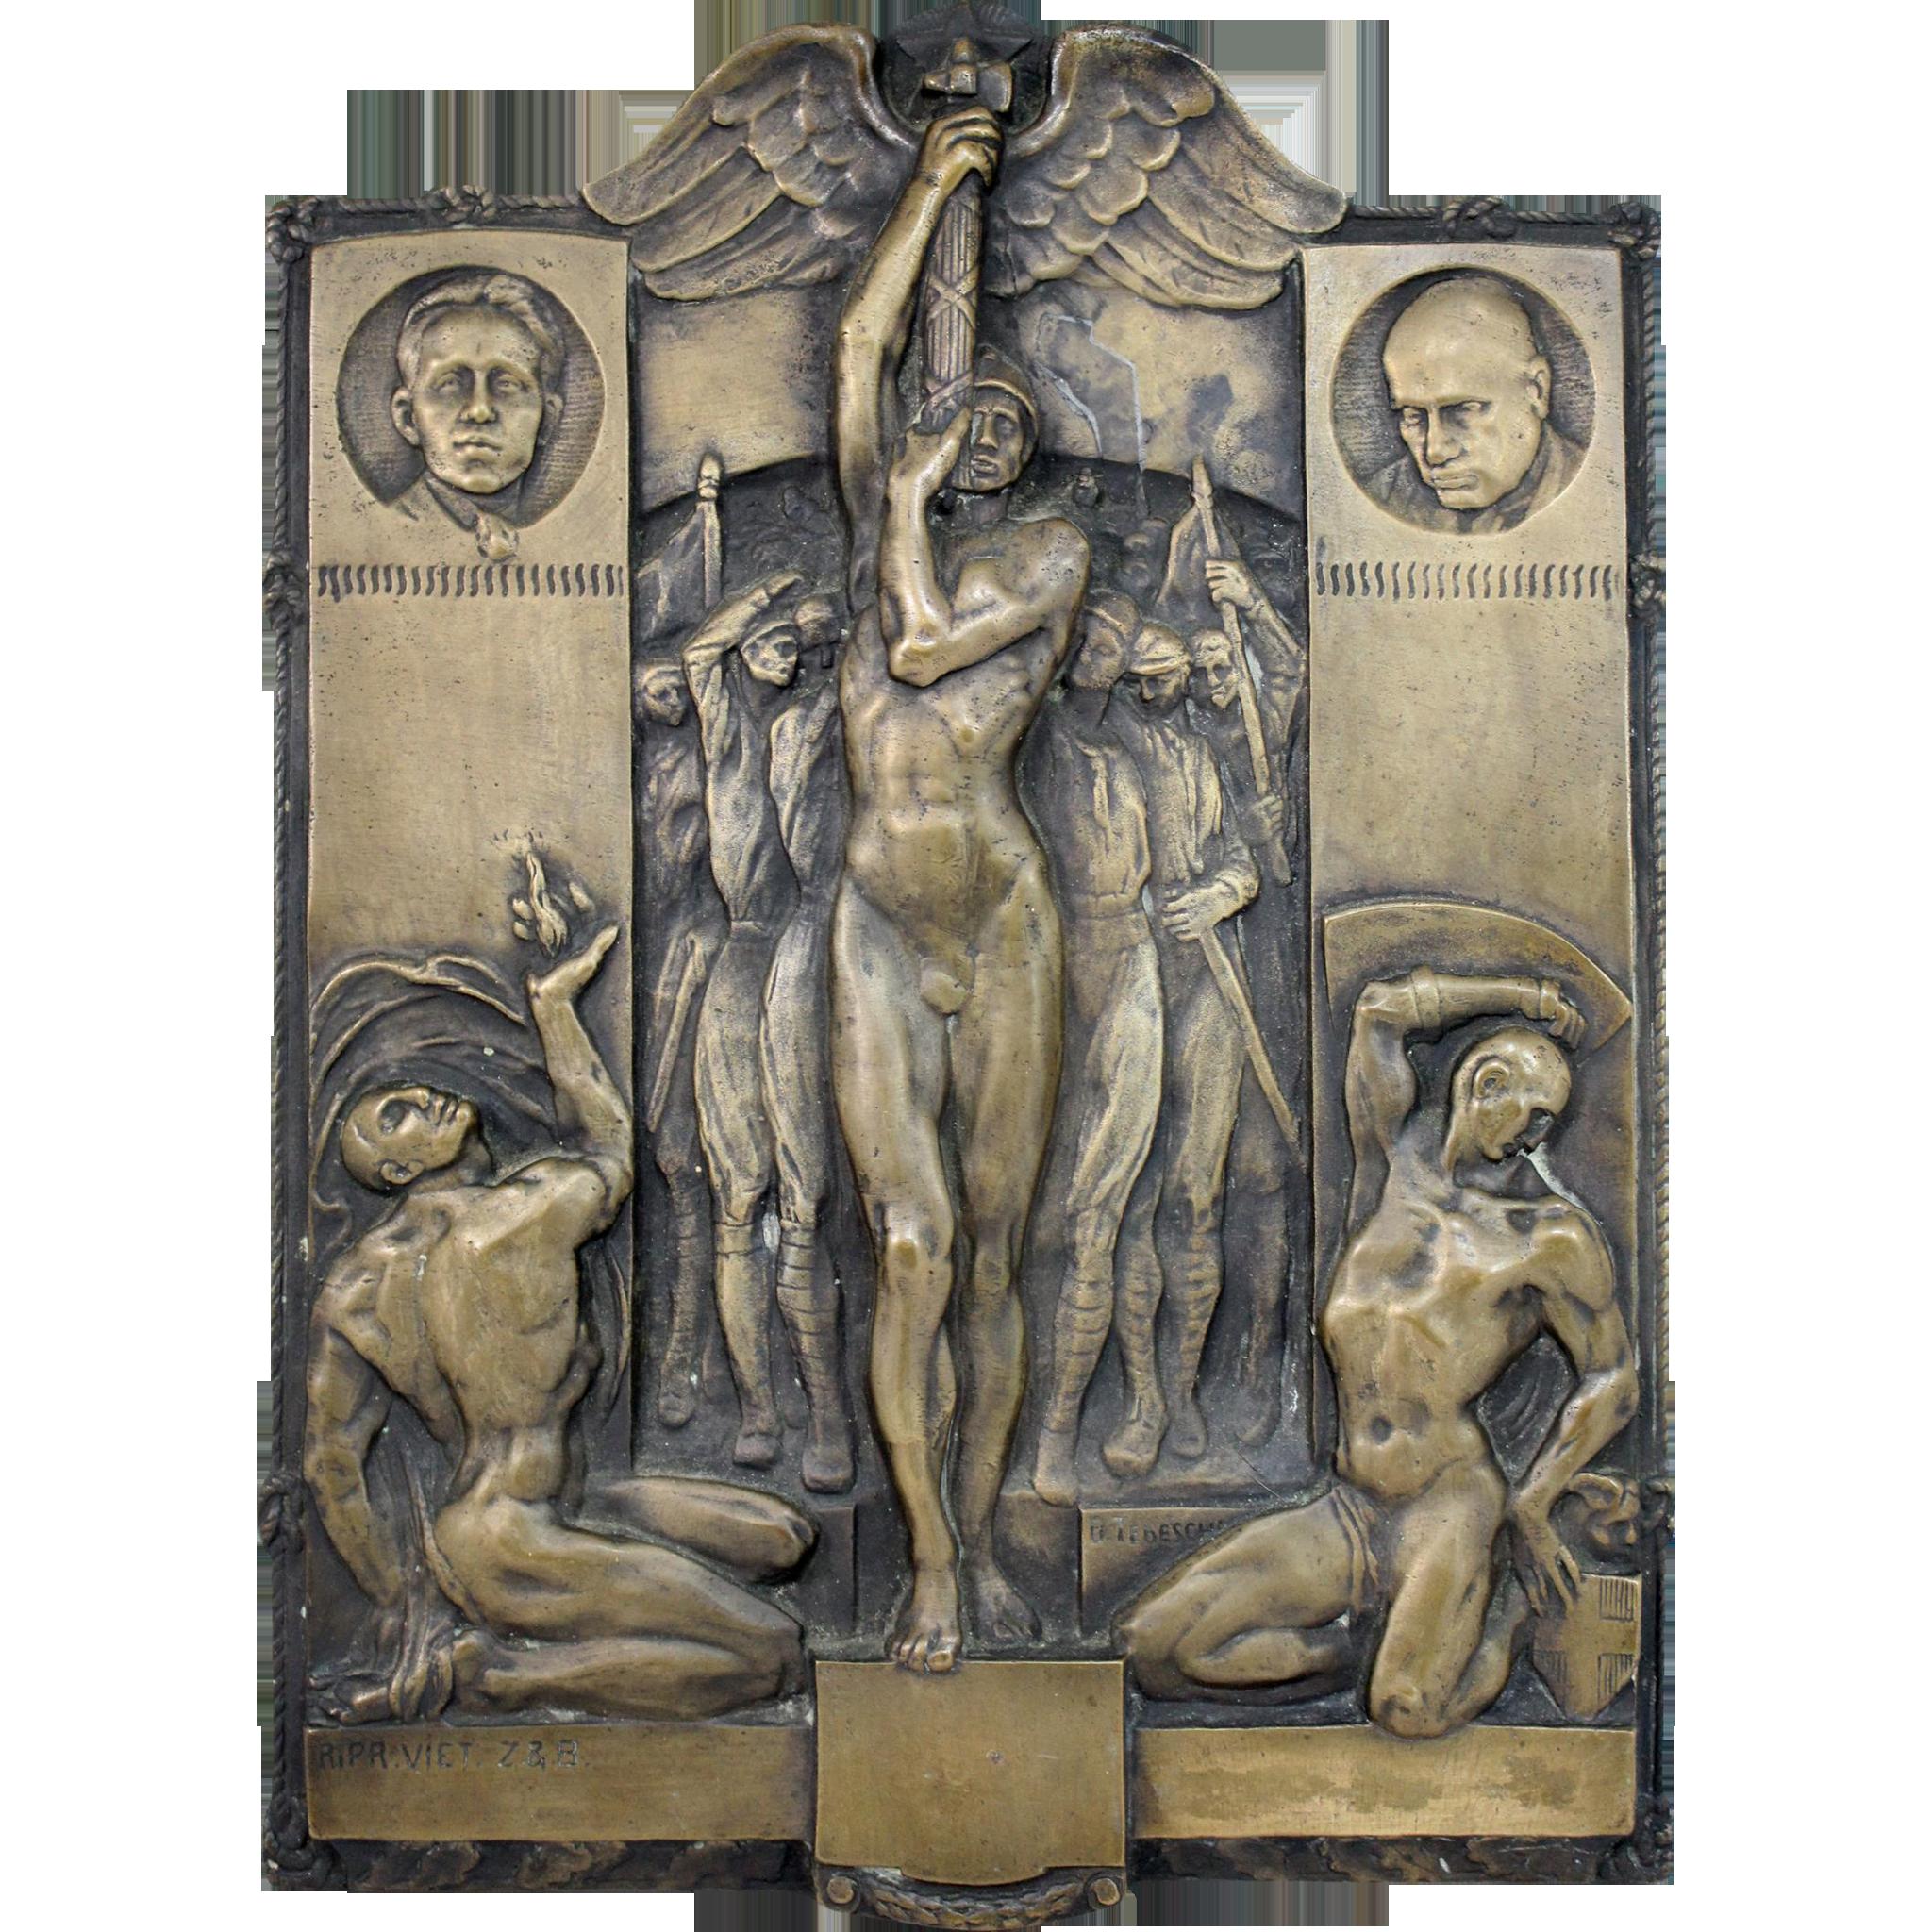 Giovanni Battista Tedeschi Bronze Plaque of Birth of Fascism & March On Rome 1922